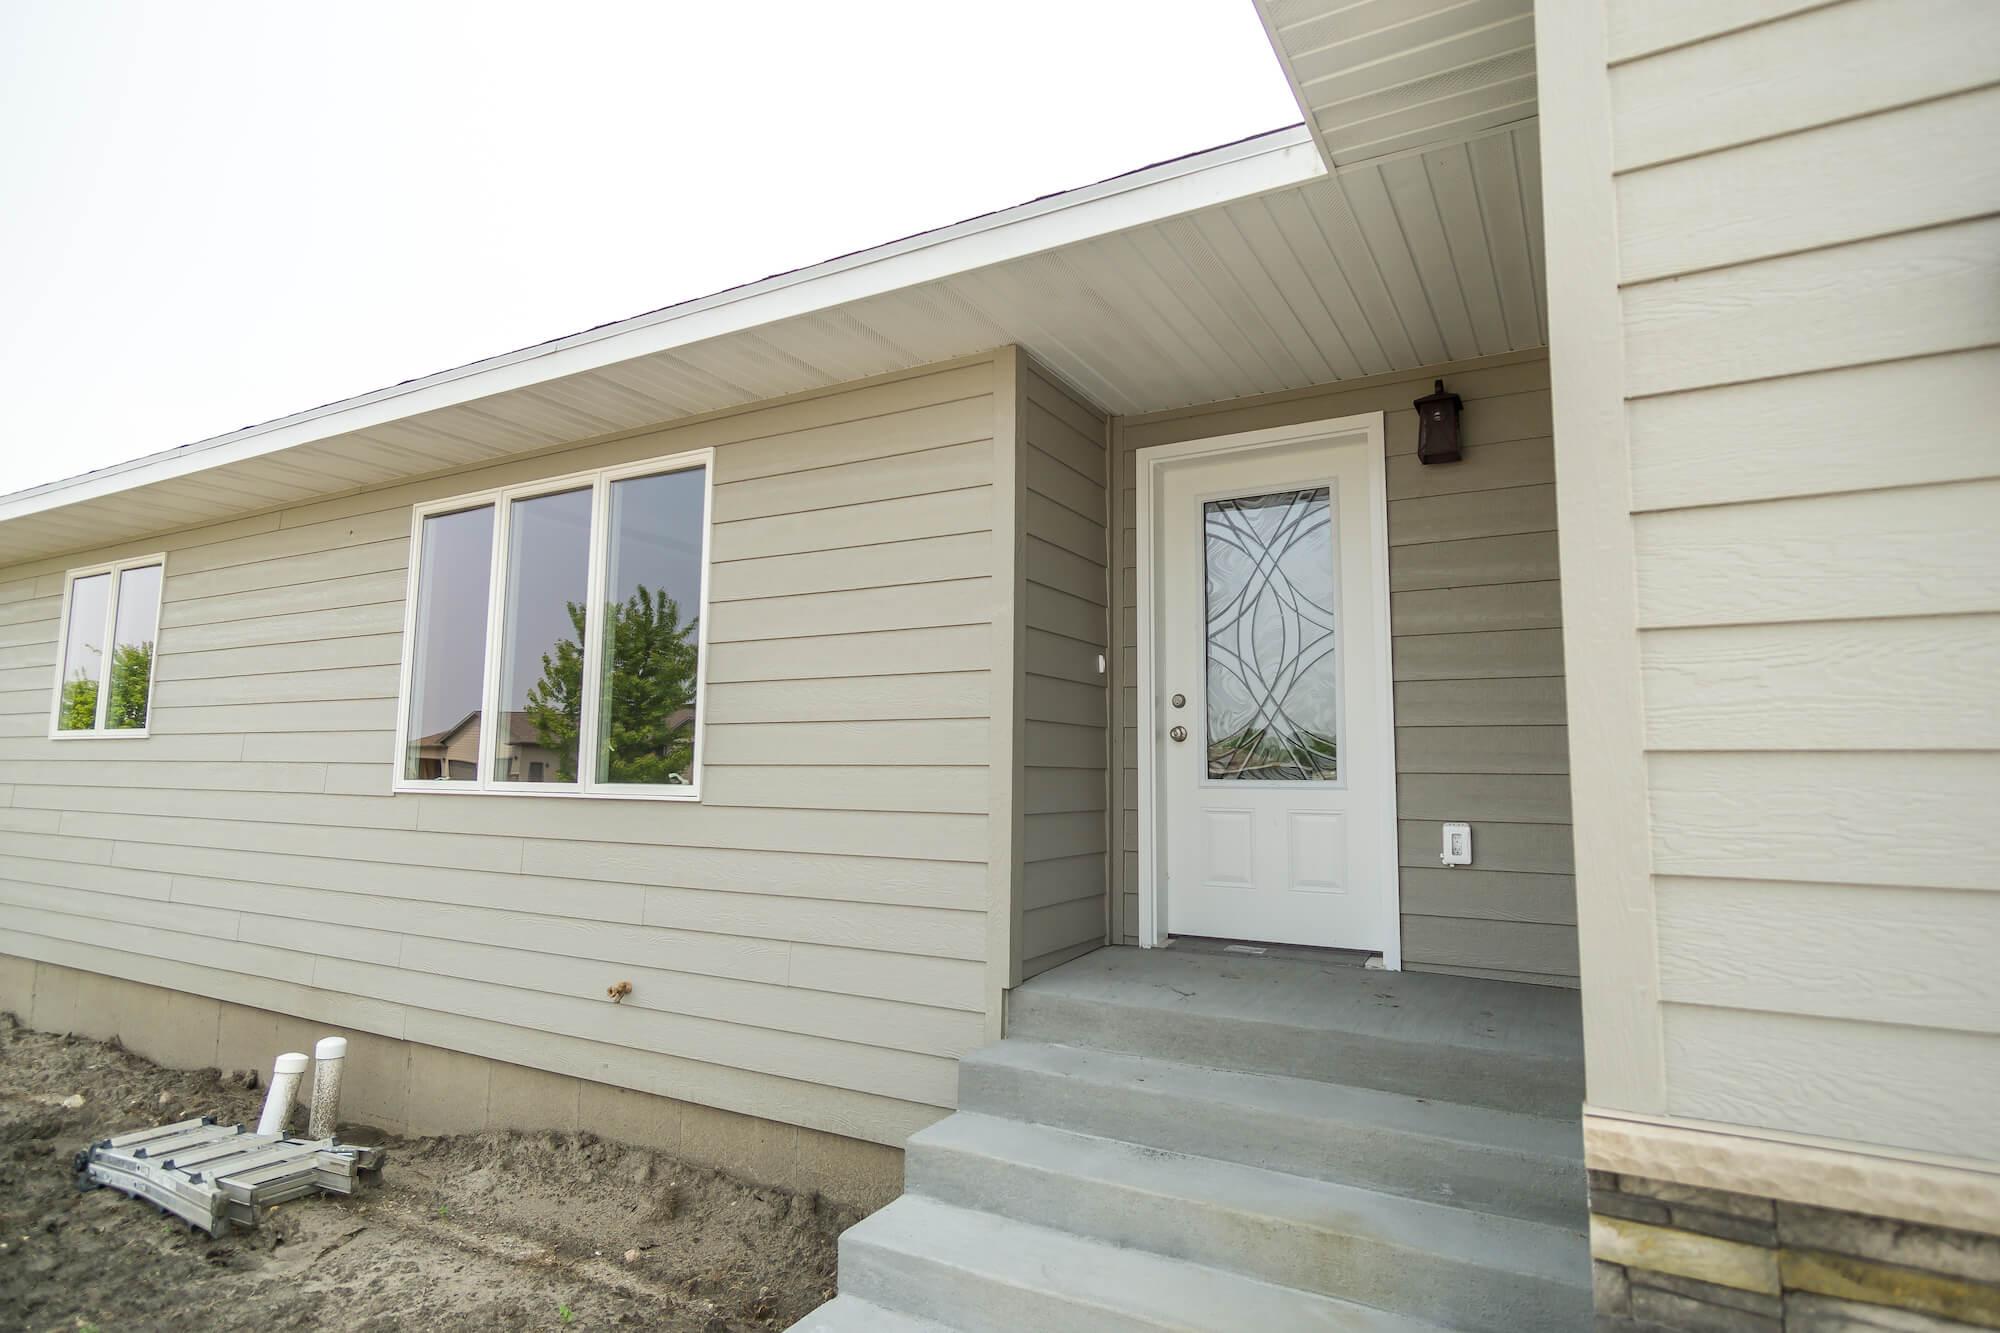 2019-5-30 Mitchell Spec Home Kemper Avenue Compressed 2.jpg